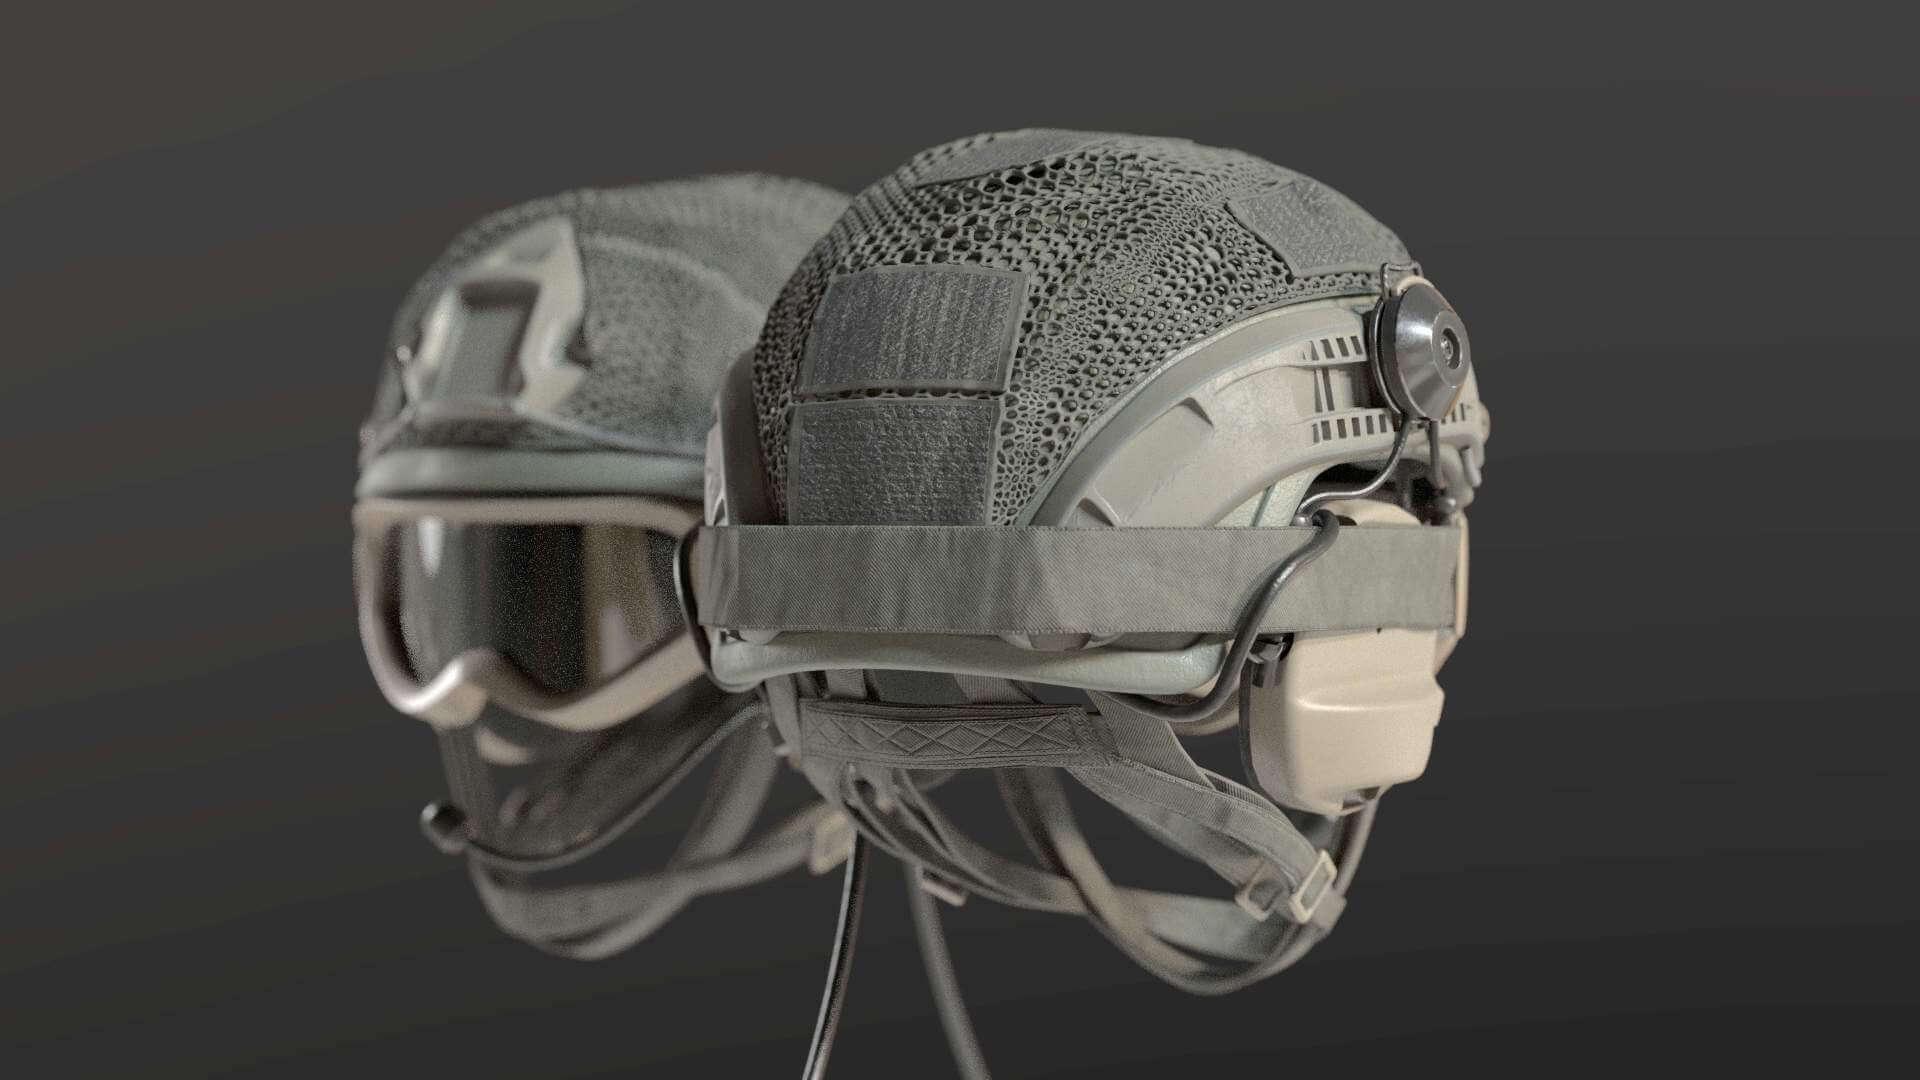 Ballistic Military Helmet with Goggles 3D Model